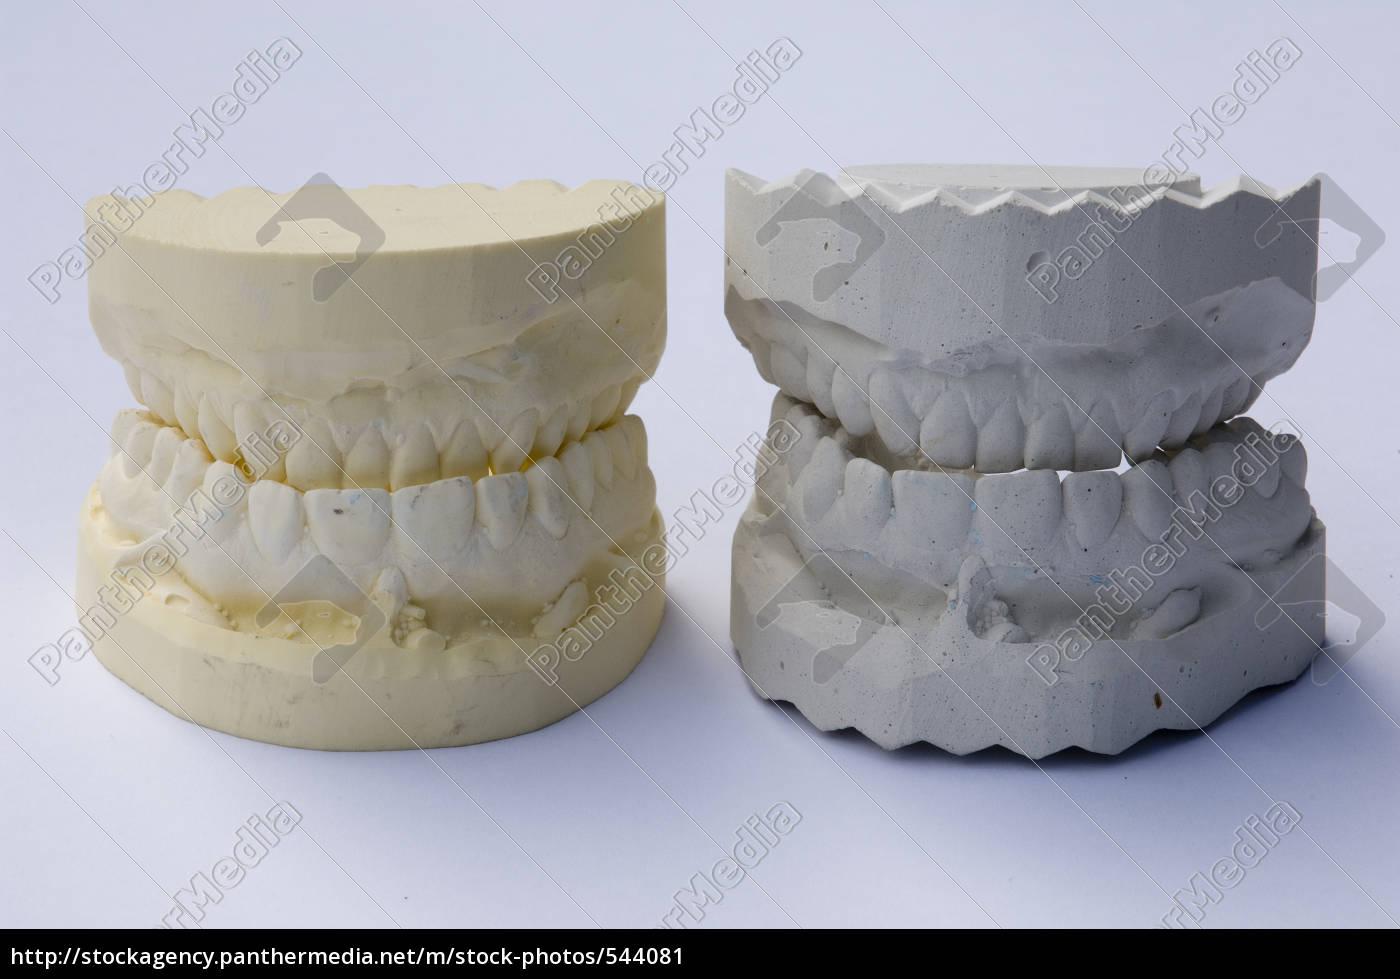 dentures - 544081